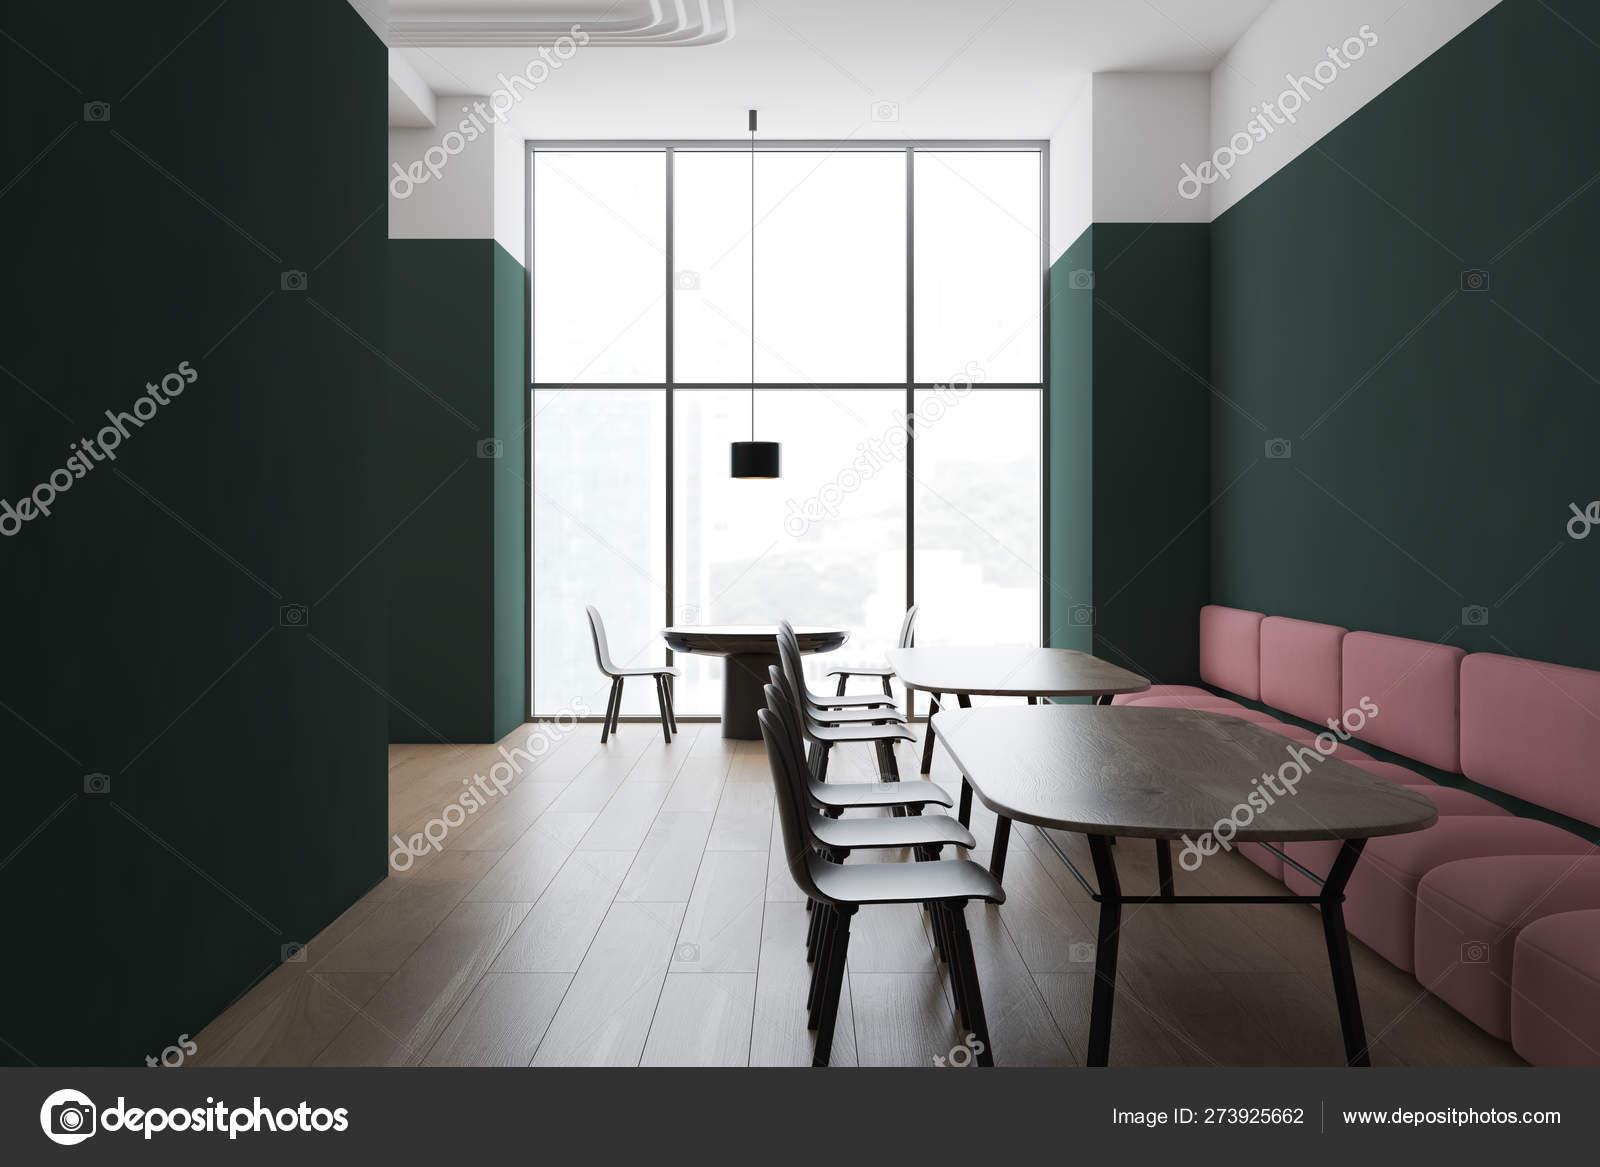 Green And White Restaurant Corner With Sofa Stock Photo C Denisismagilov 273925662